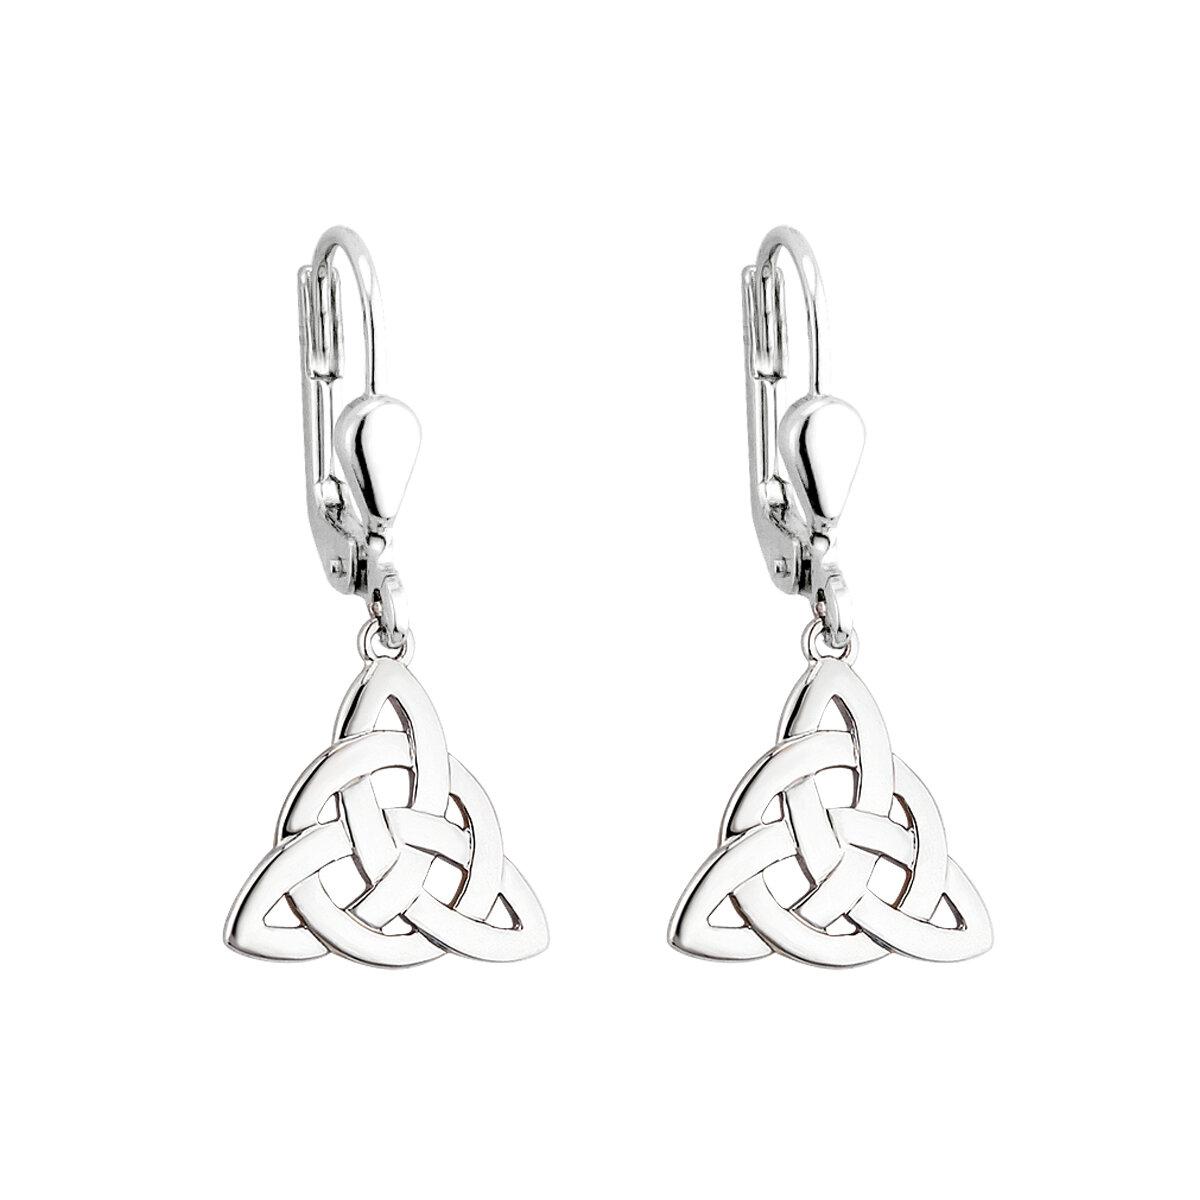 sterling silver celtic knot drop earrings s3694 from Solvar